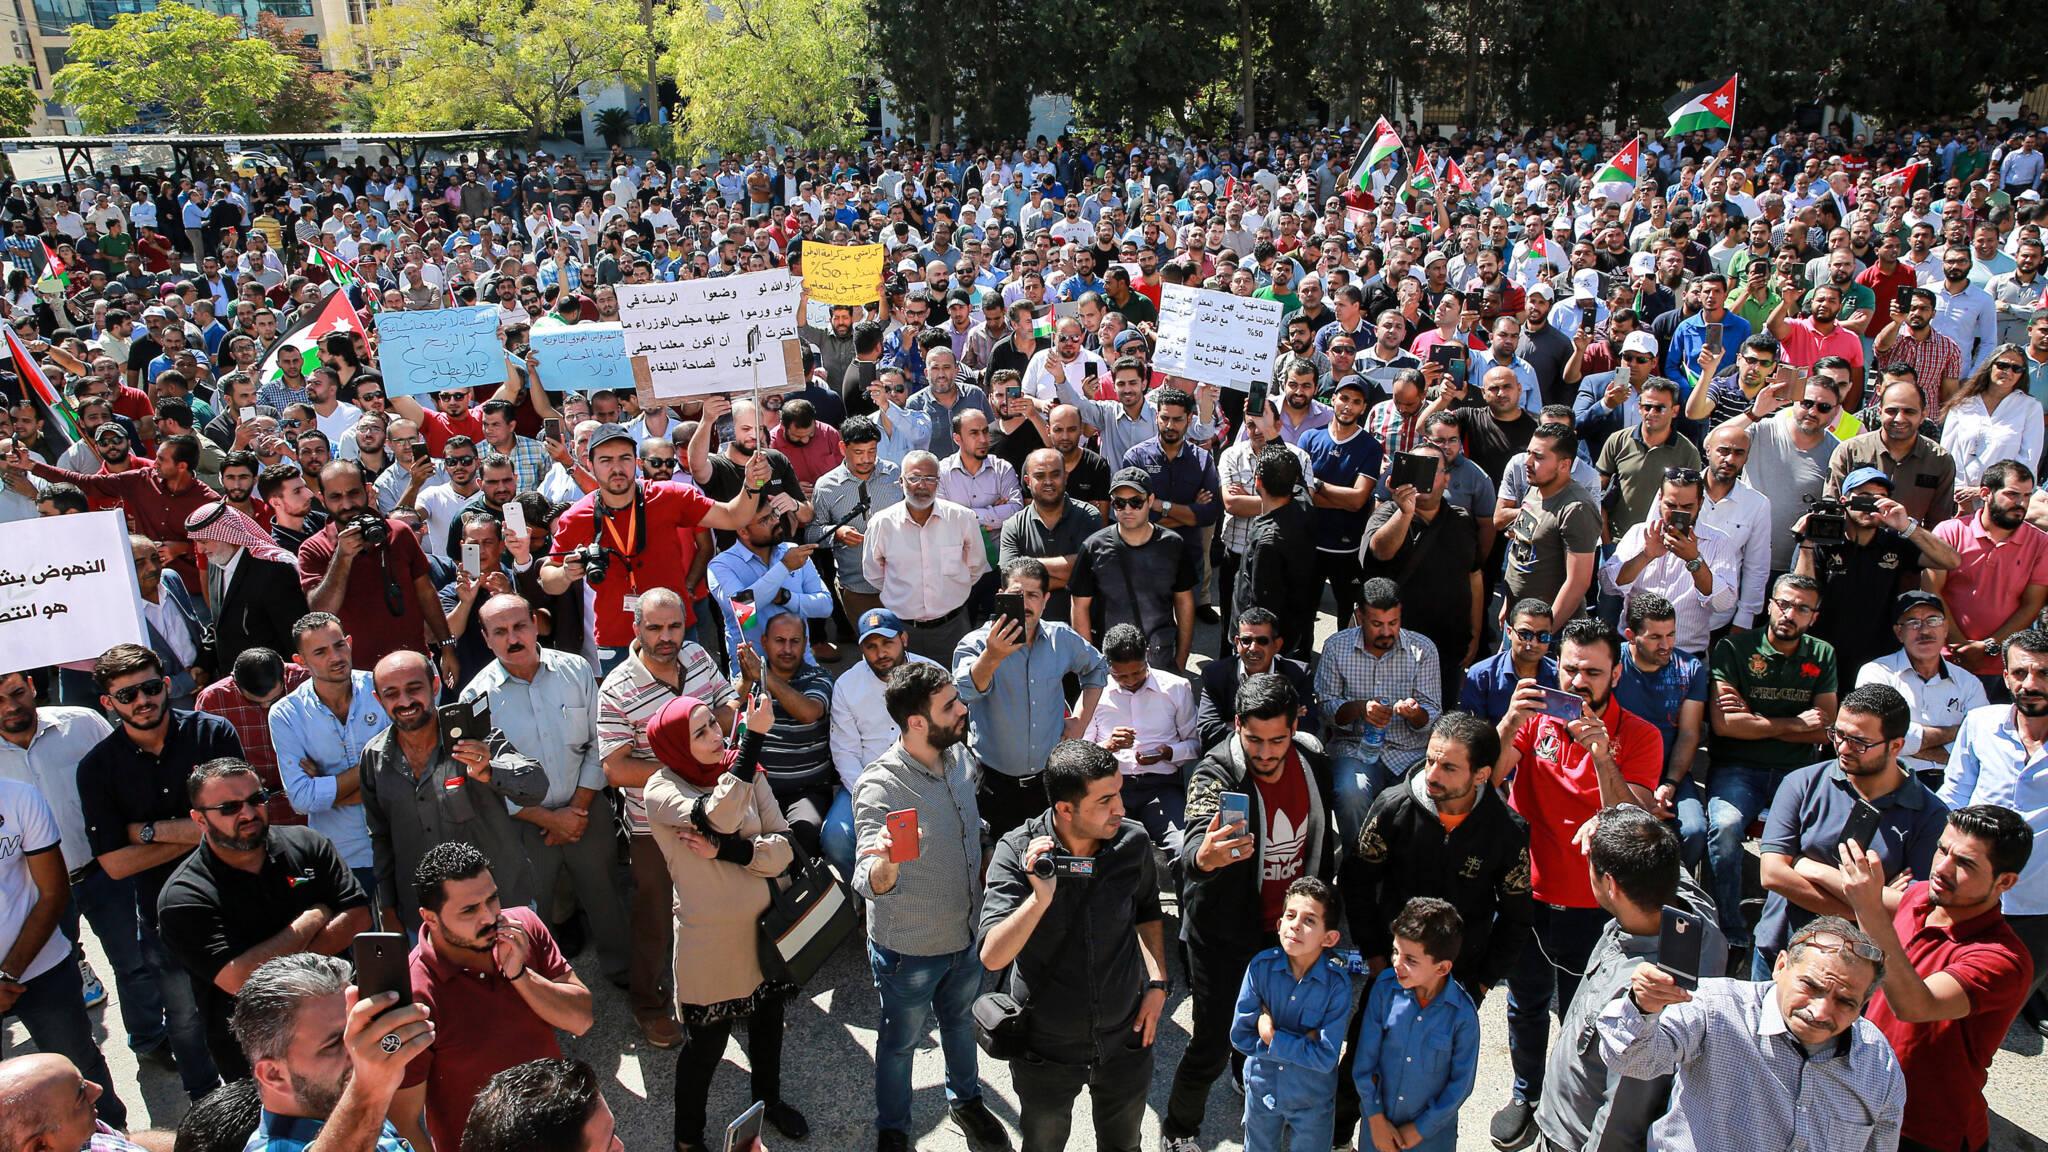 Striking teachers rally in Amman, Jordan, early October 2019, AFP photo